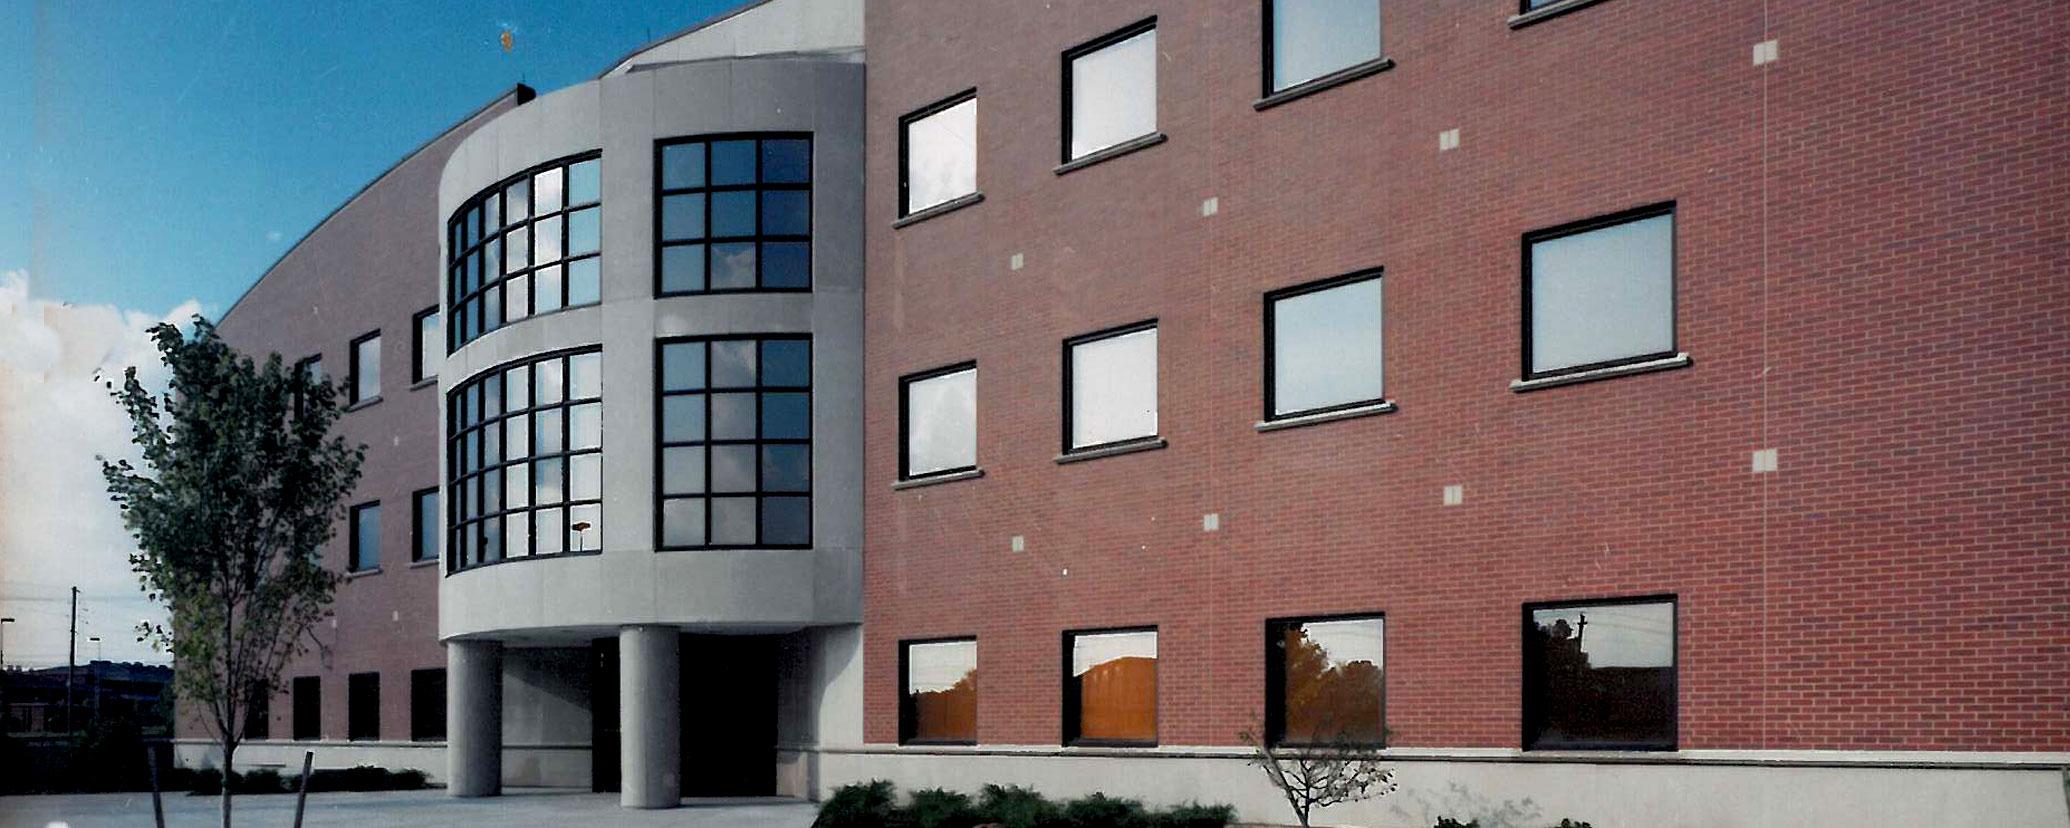 Barracks Complex Fort Knox KY  Caddell Construction Co LLC